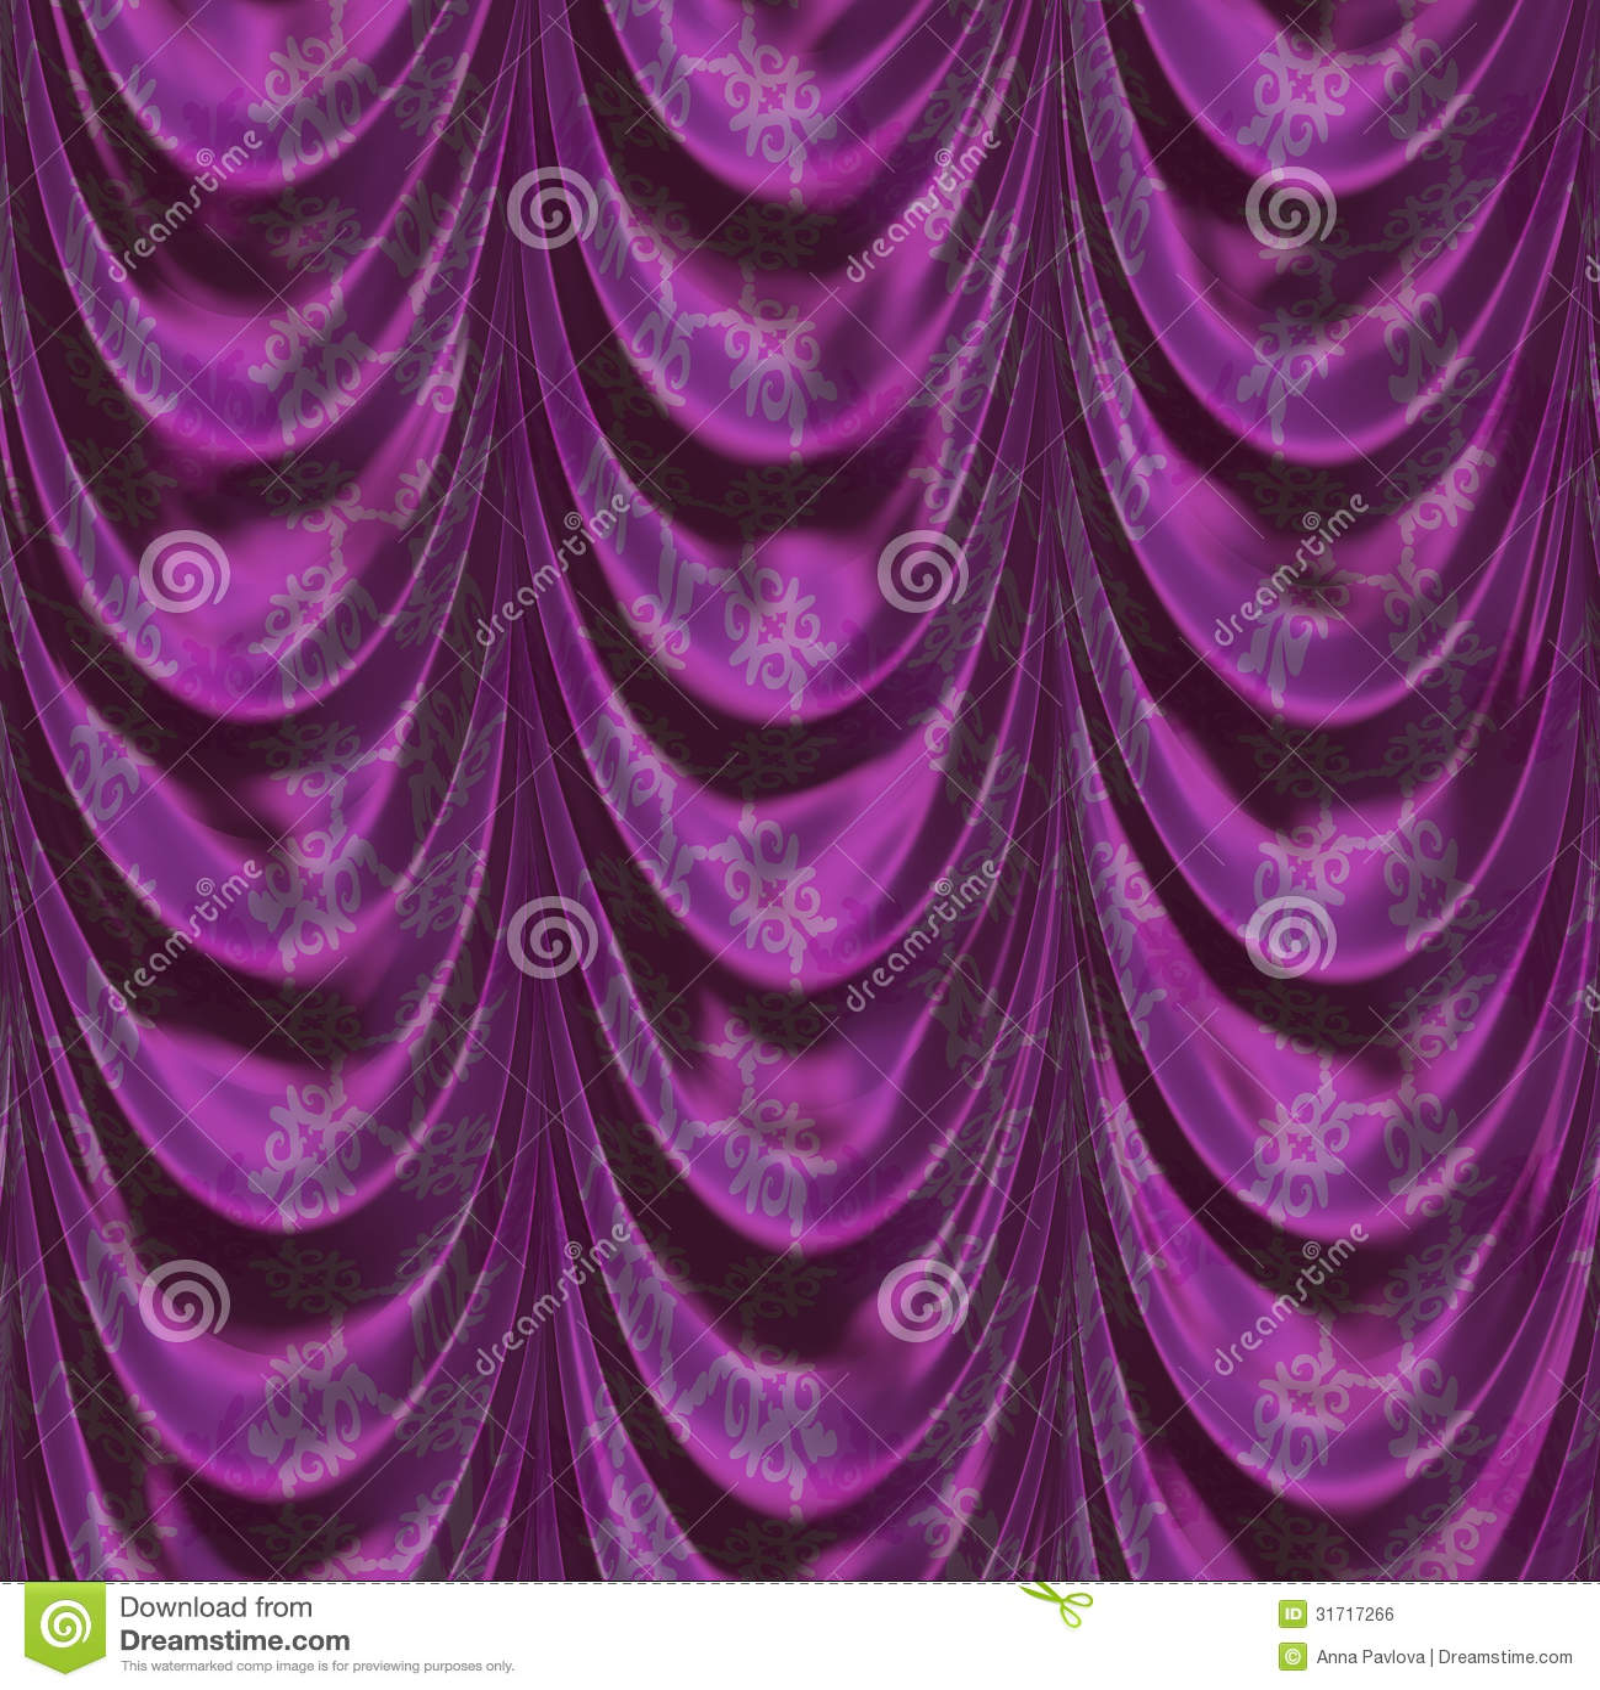 Dark Purple Curtains   Purple Curtain Background Royalty Free Stock Image  Image 31717266  Dark Purple Curtains